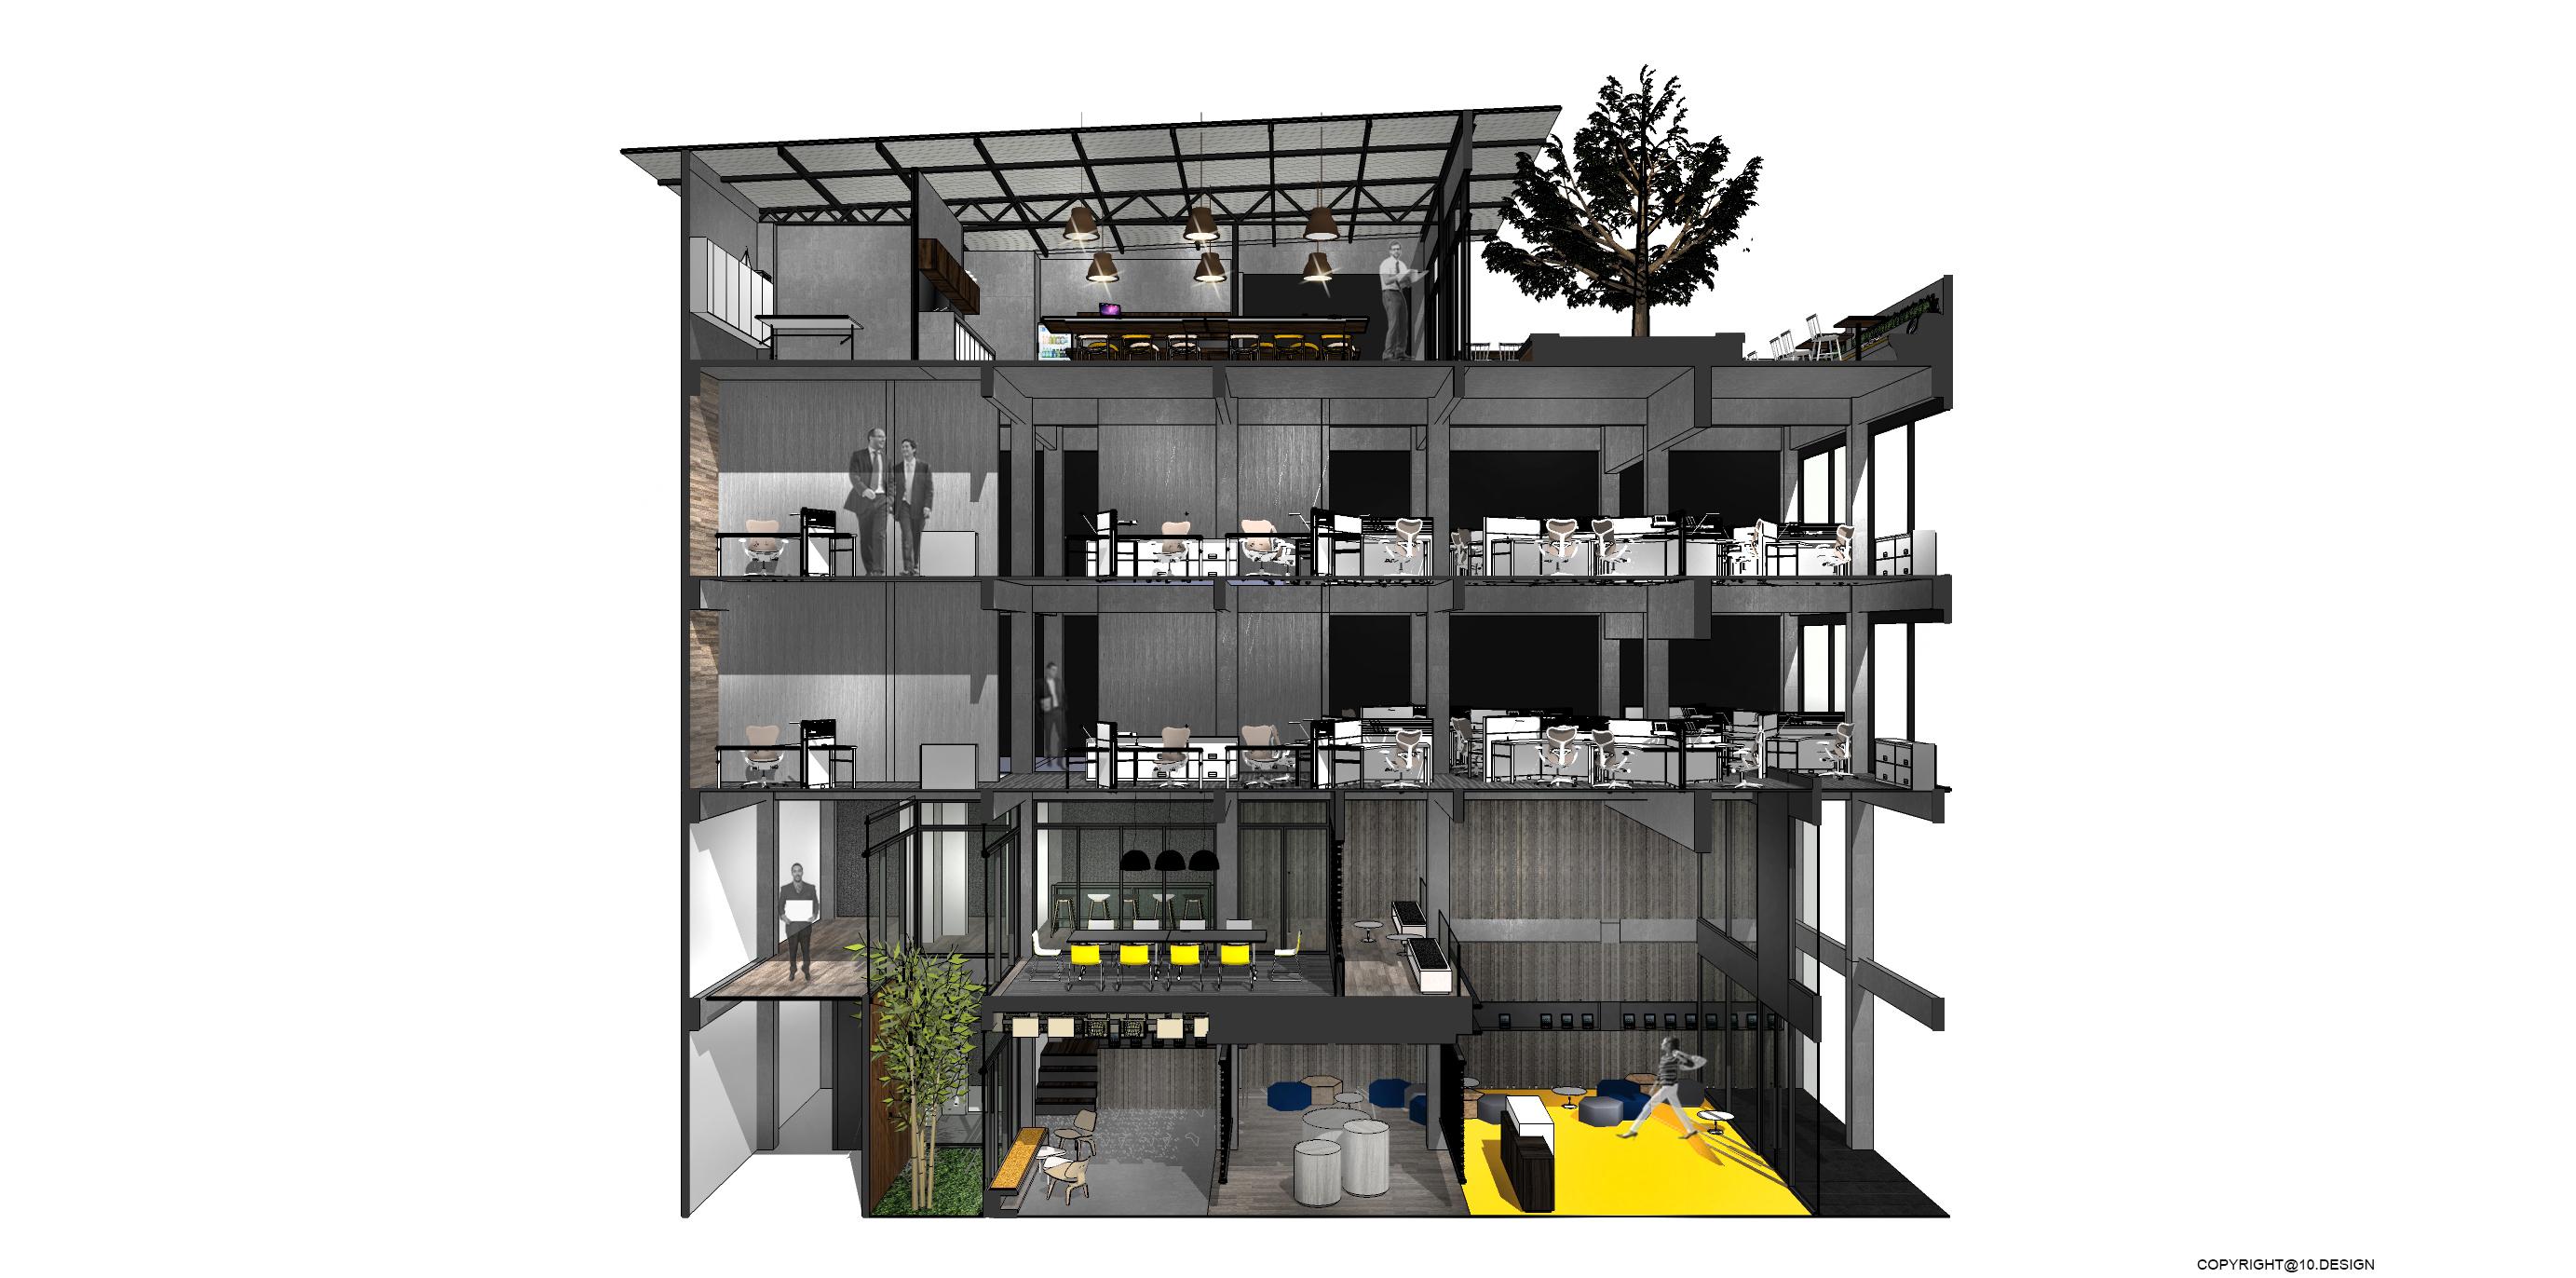 10DESIGN ookbee head office interior design start up THAILAND 03